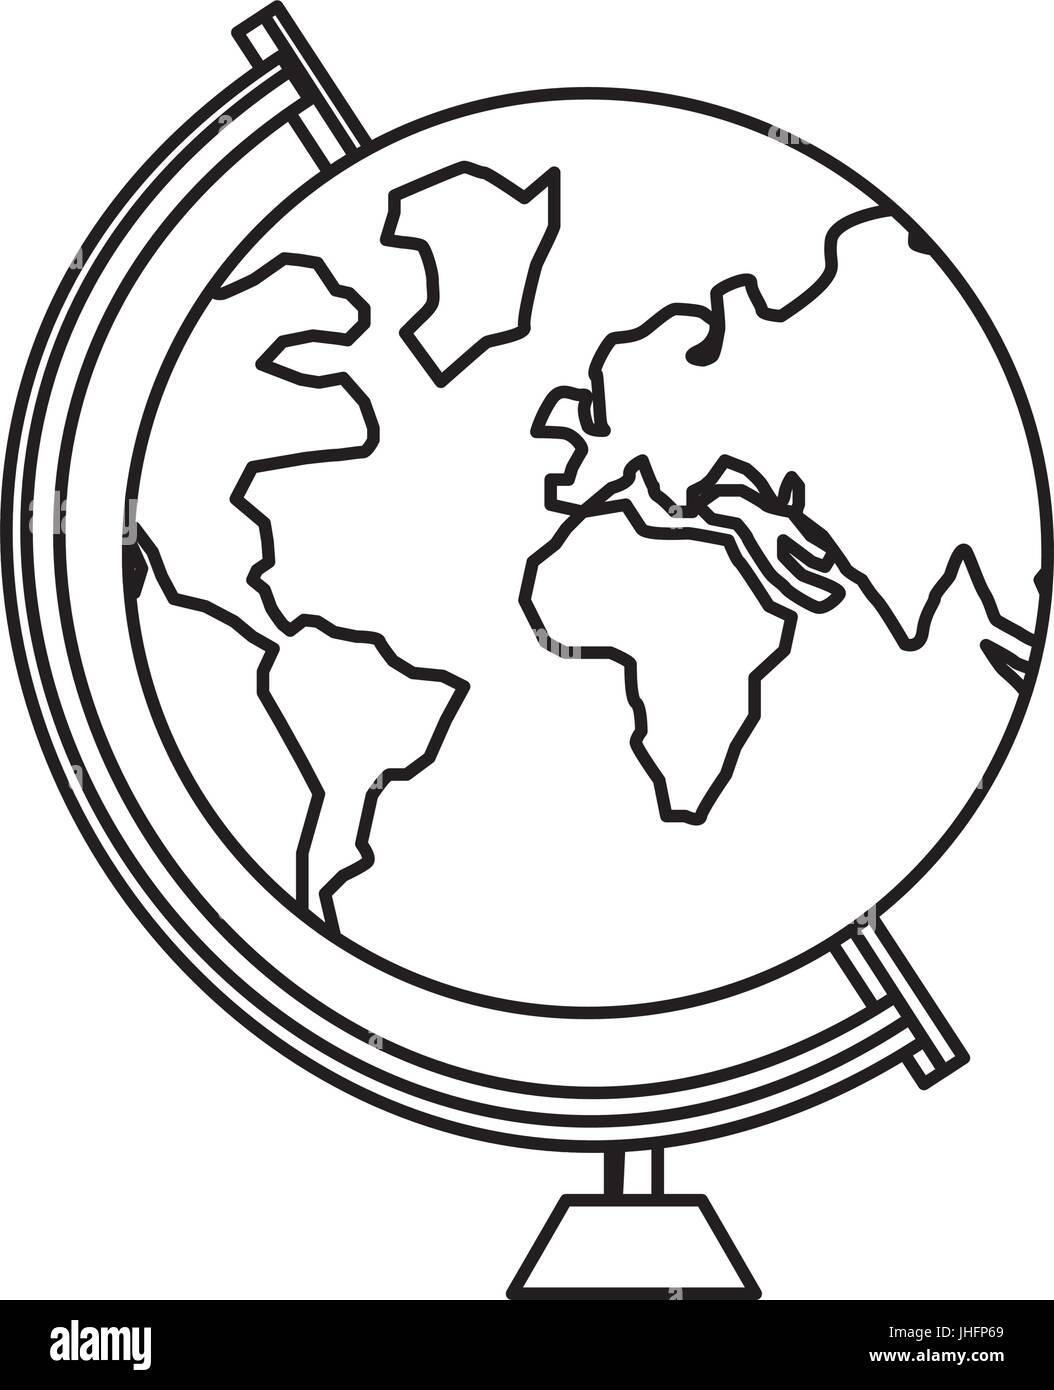 Icono De Globo Terráqueo Escolar Ilustración Vectorial Diseño